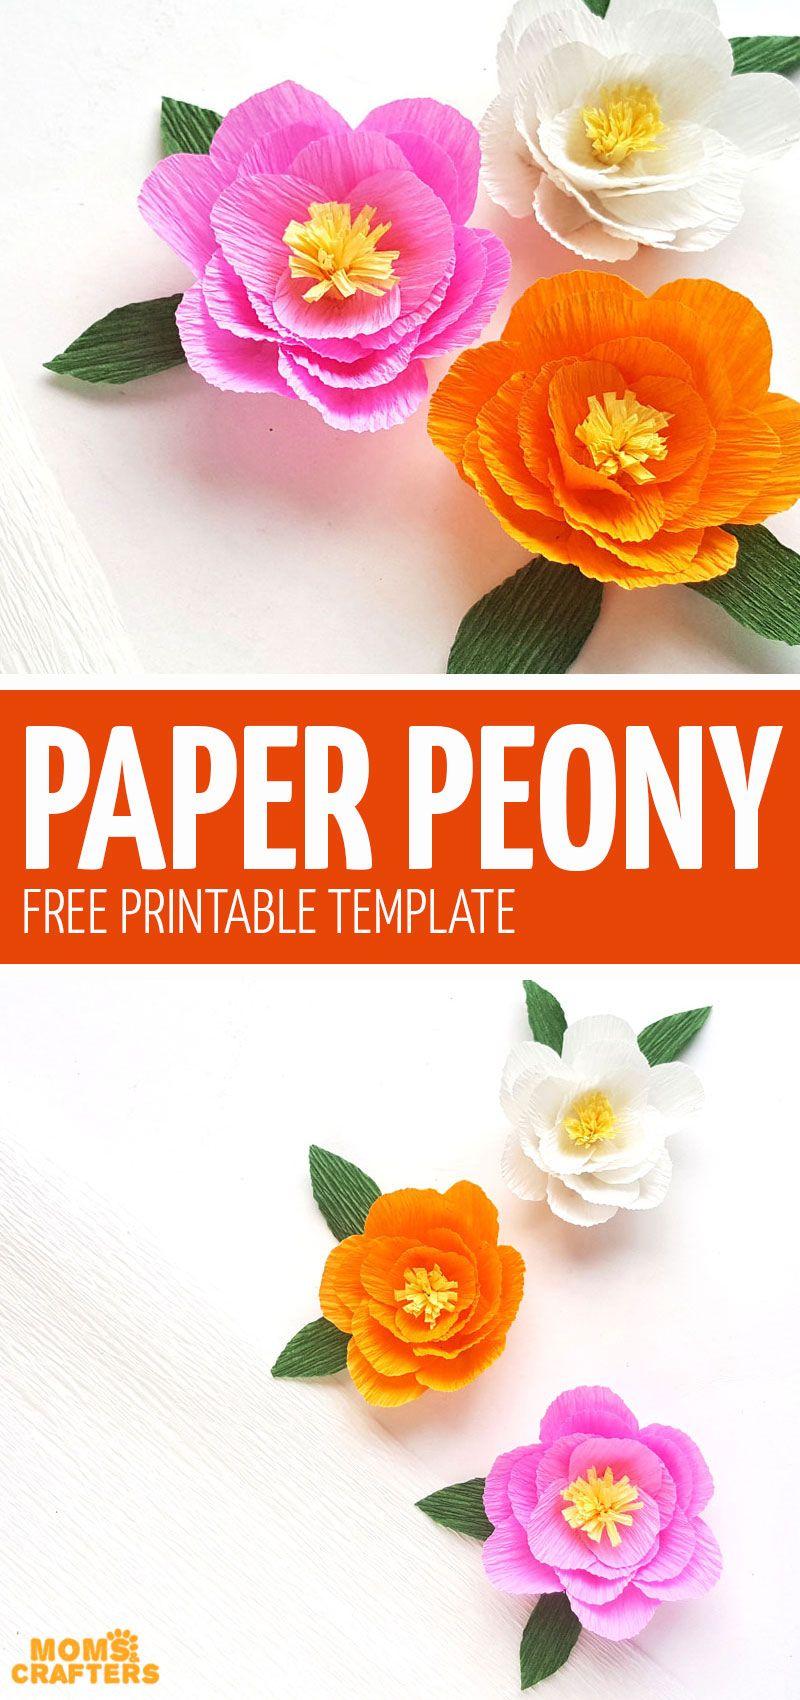 Crepe Paper Peony Template - free printable -   19 diy paper peonies ideas